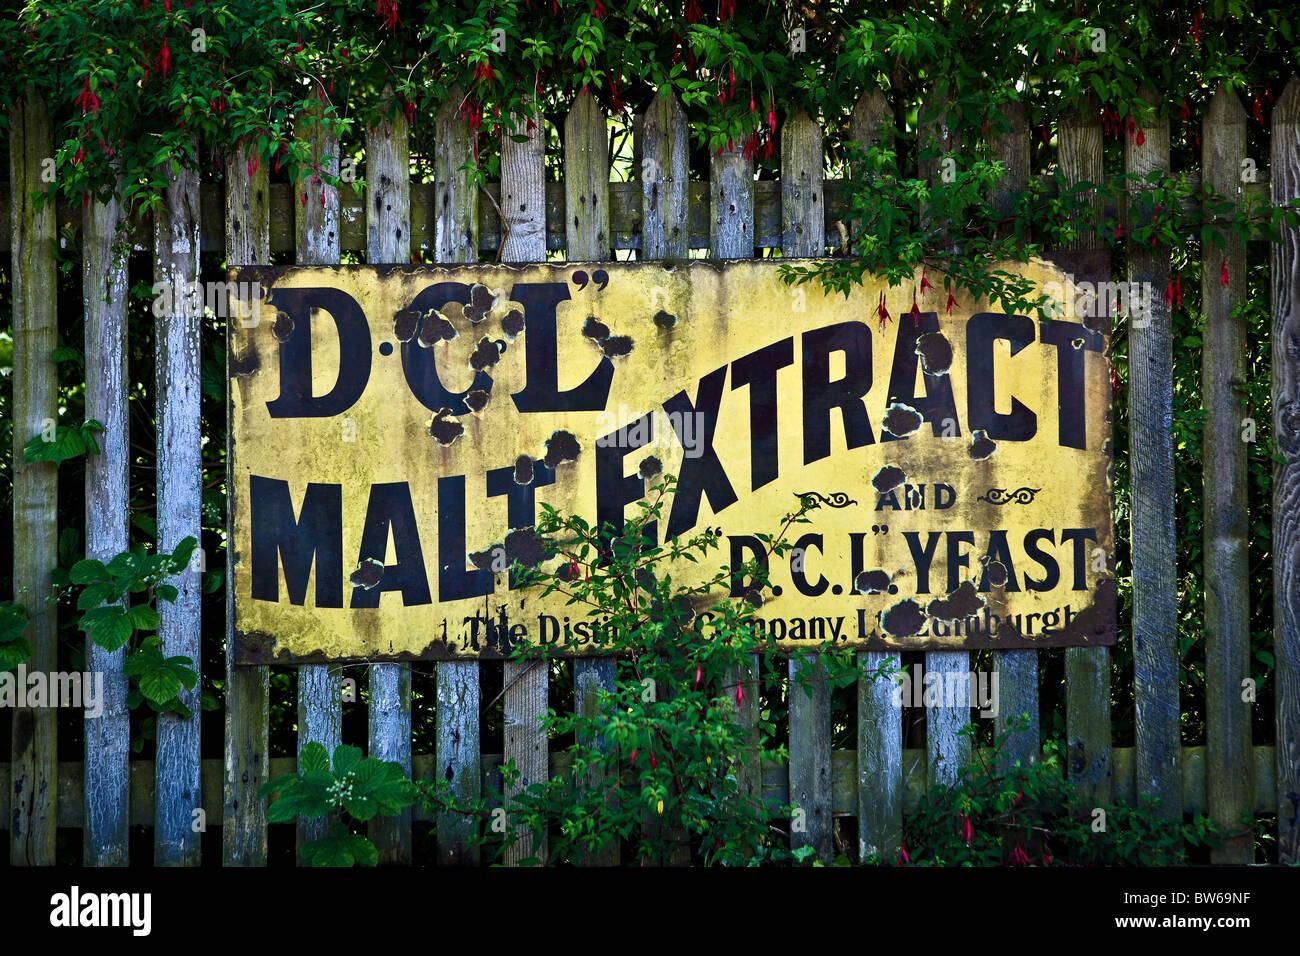 old railway station advert. Caledonian railways.Bridge of Dun railway station Montrose. - Stock Image